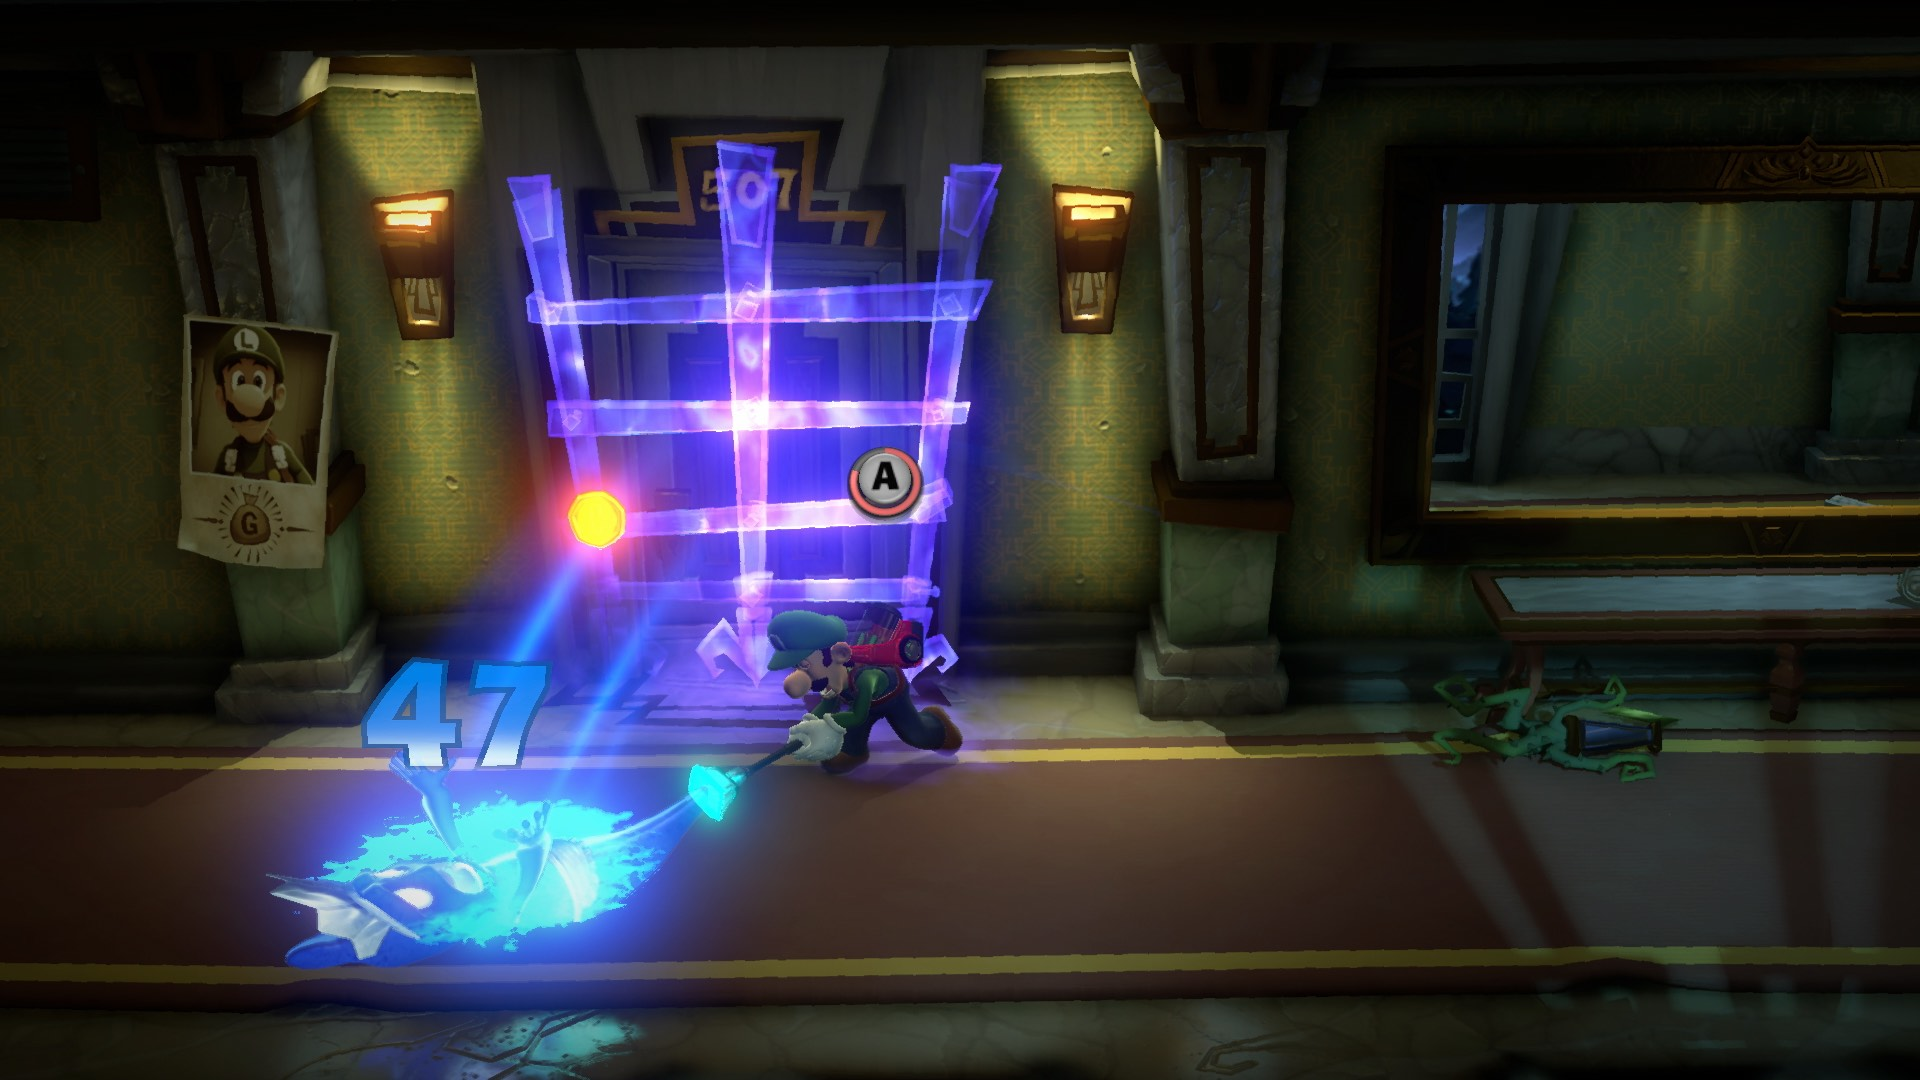 Luigi's Mansion 3 Preview Screenshot 2